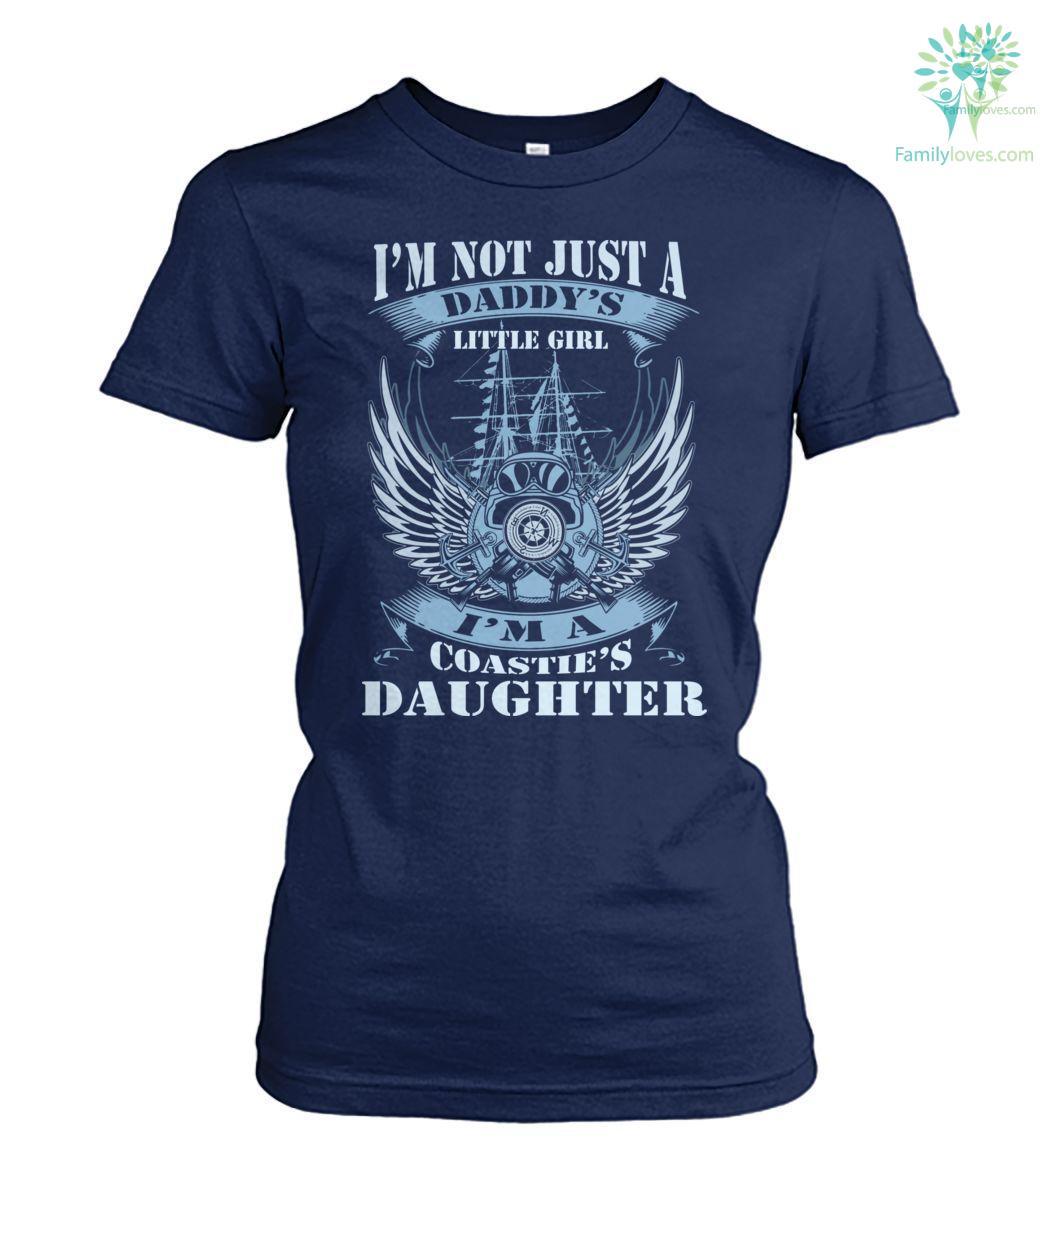 i-m-not_cdcb011f-d024-4f48-4cc5-45e206317943 i'm not just a daddy's little girl i'm a coastie's daughter Hoodies/Tshirt  %tag